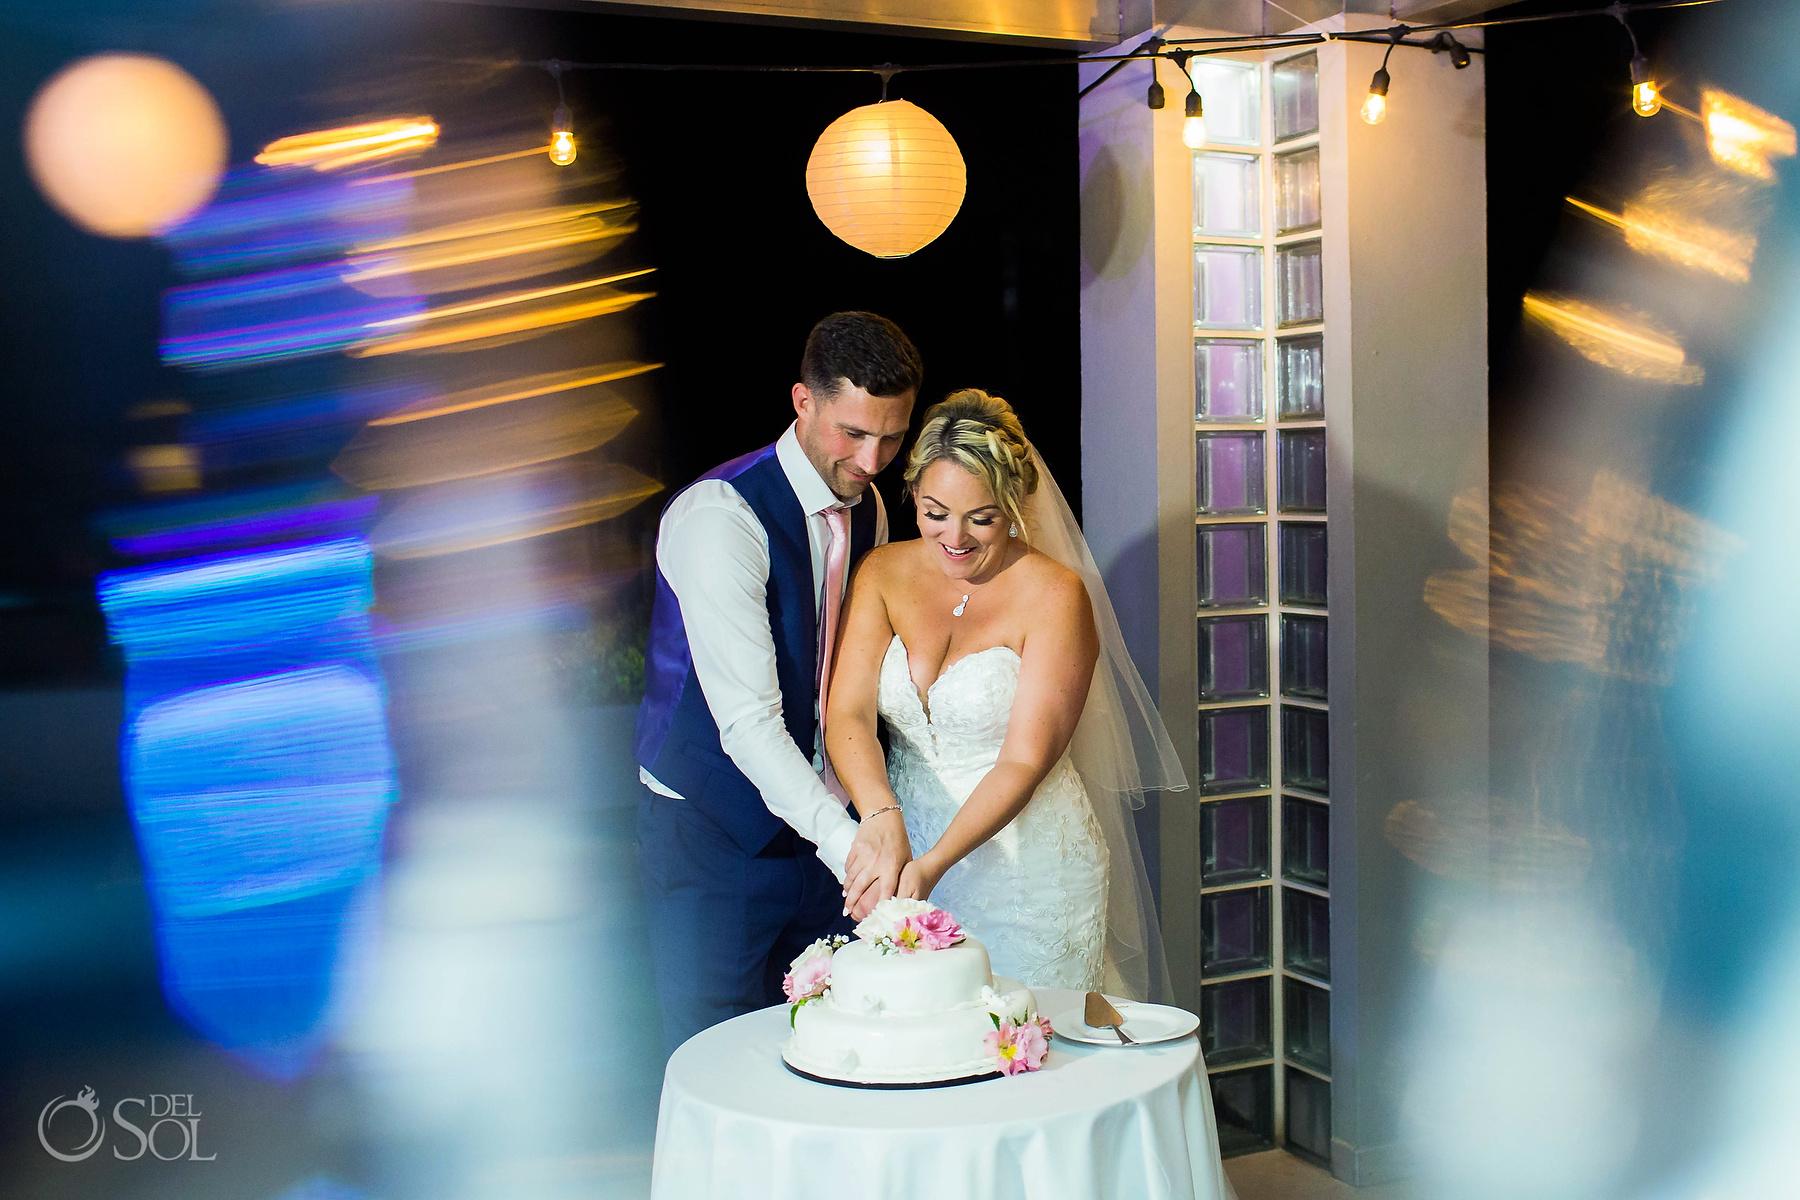 Cutting the cake Riu Palace Wedding photographer